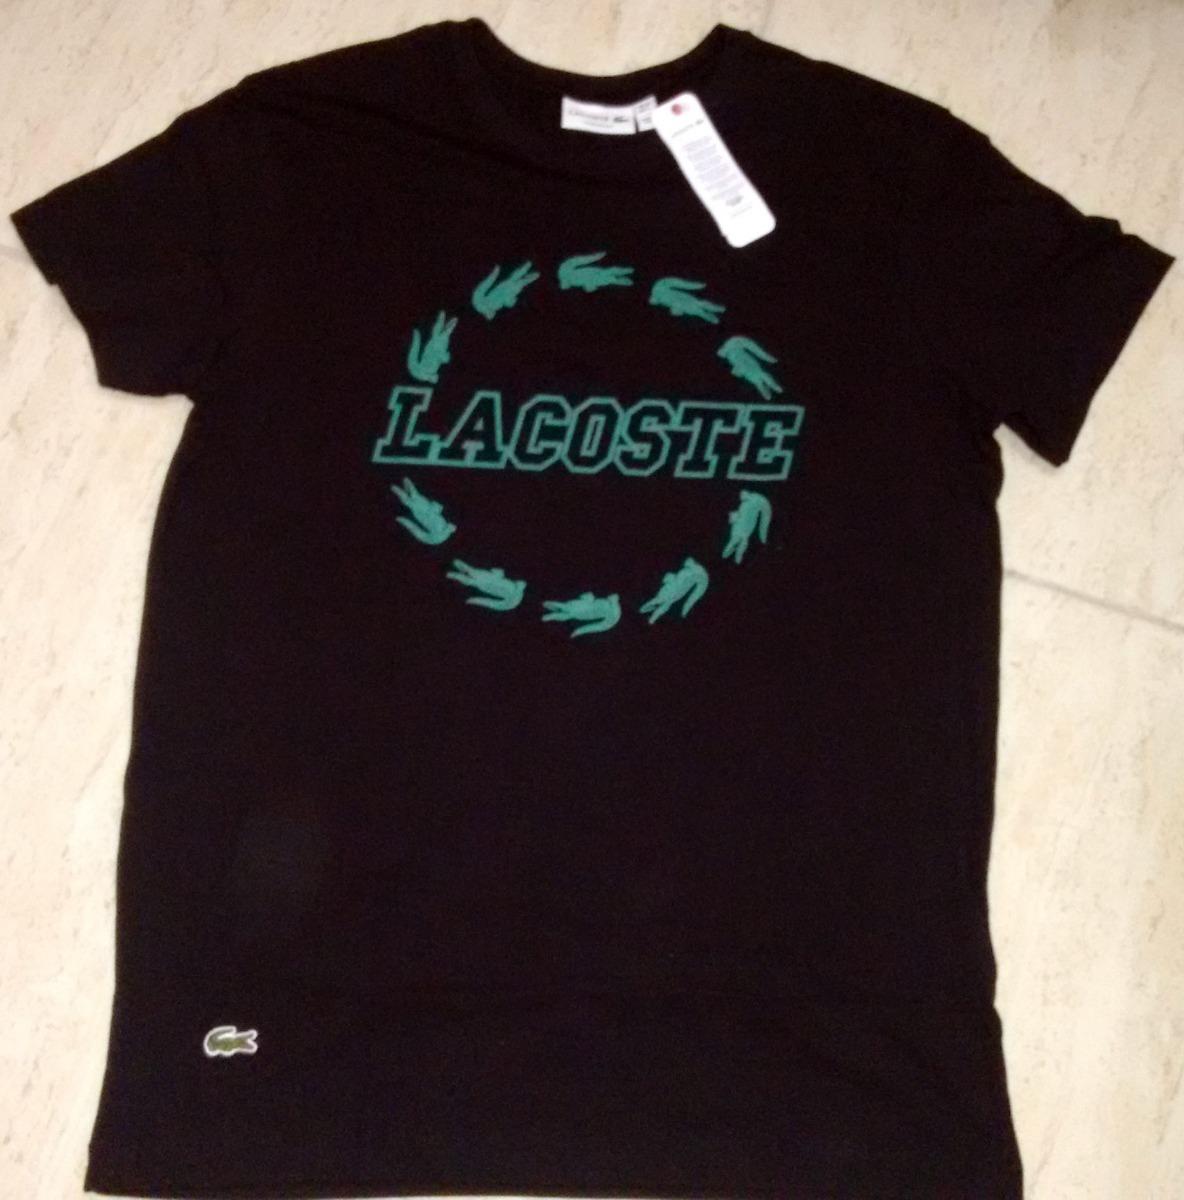 kit 5 camisetas lacoste live - frete grátis super rápido. Carregando zoom. ac6f47aa4d